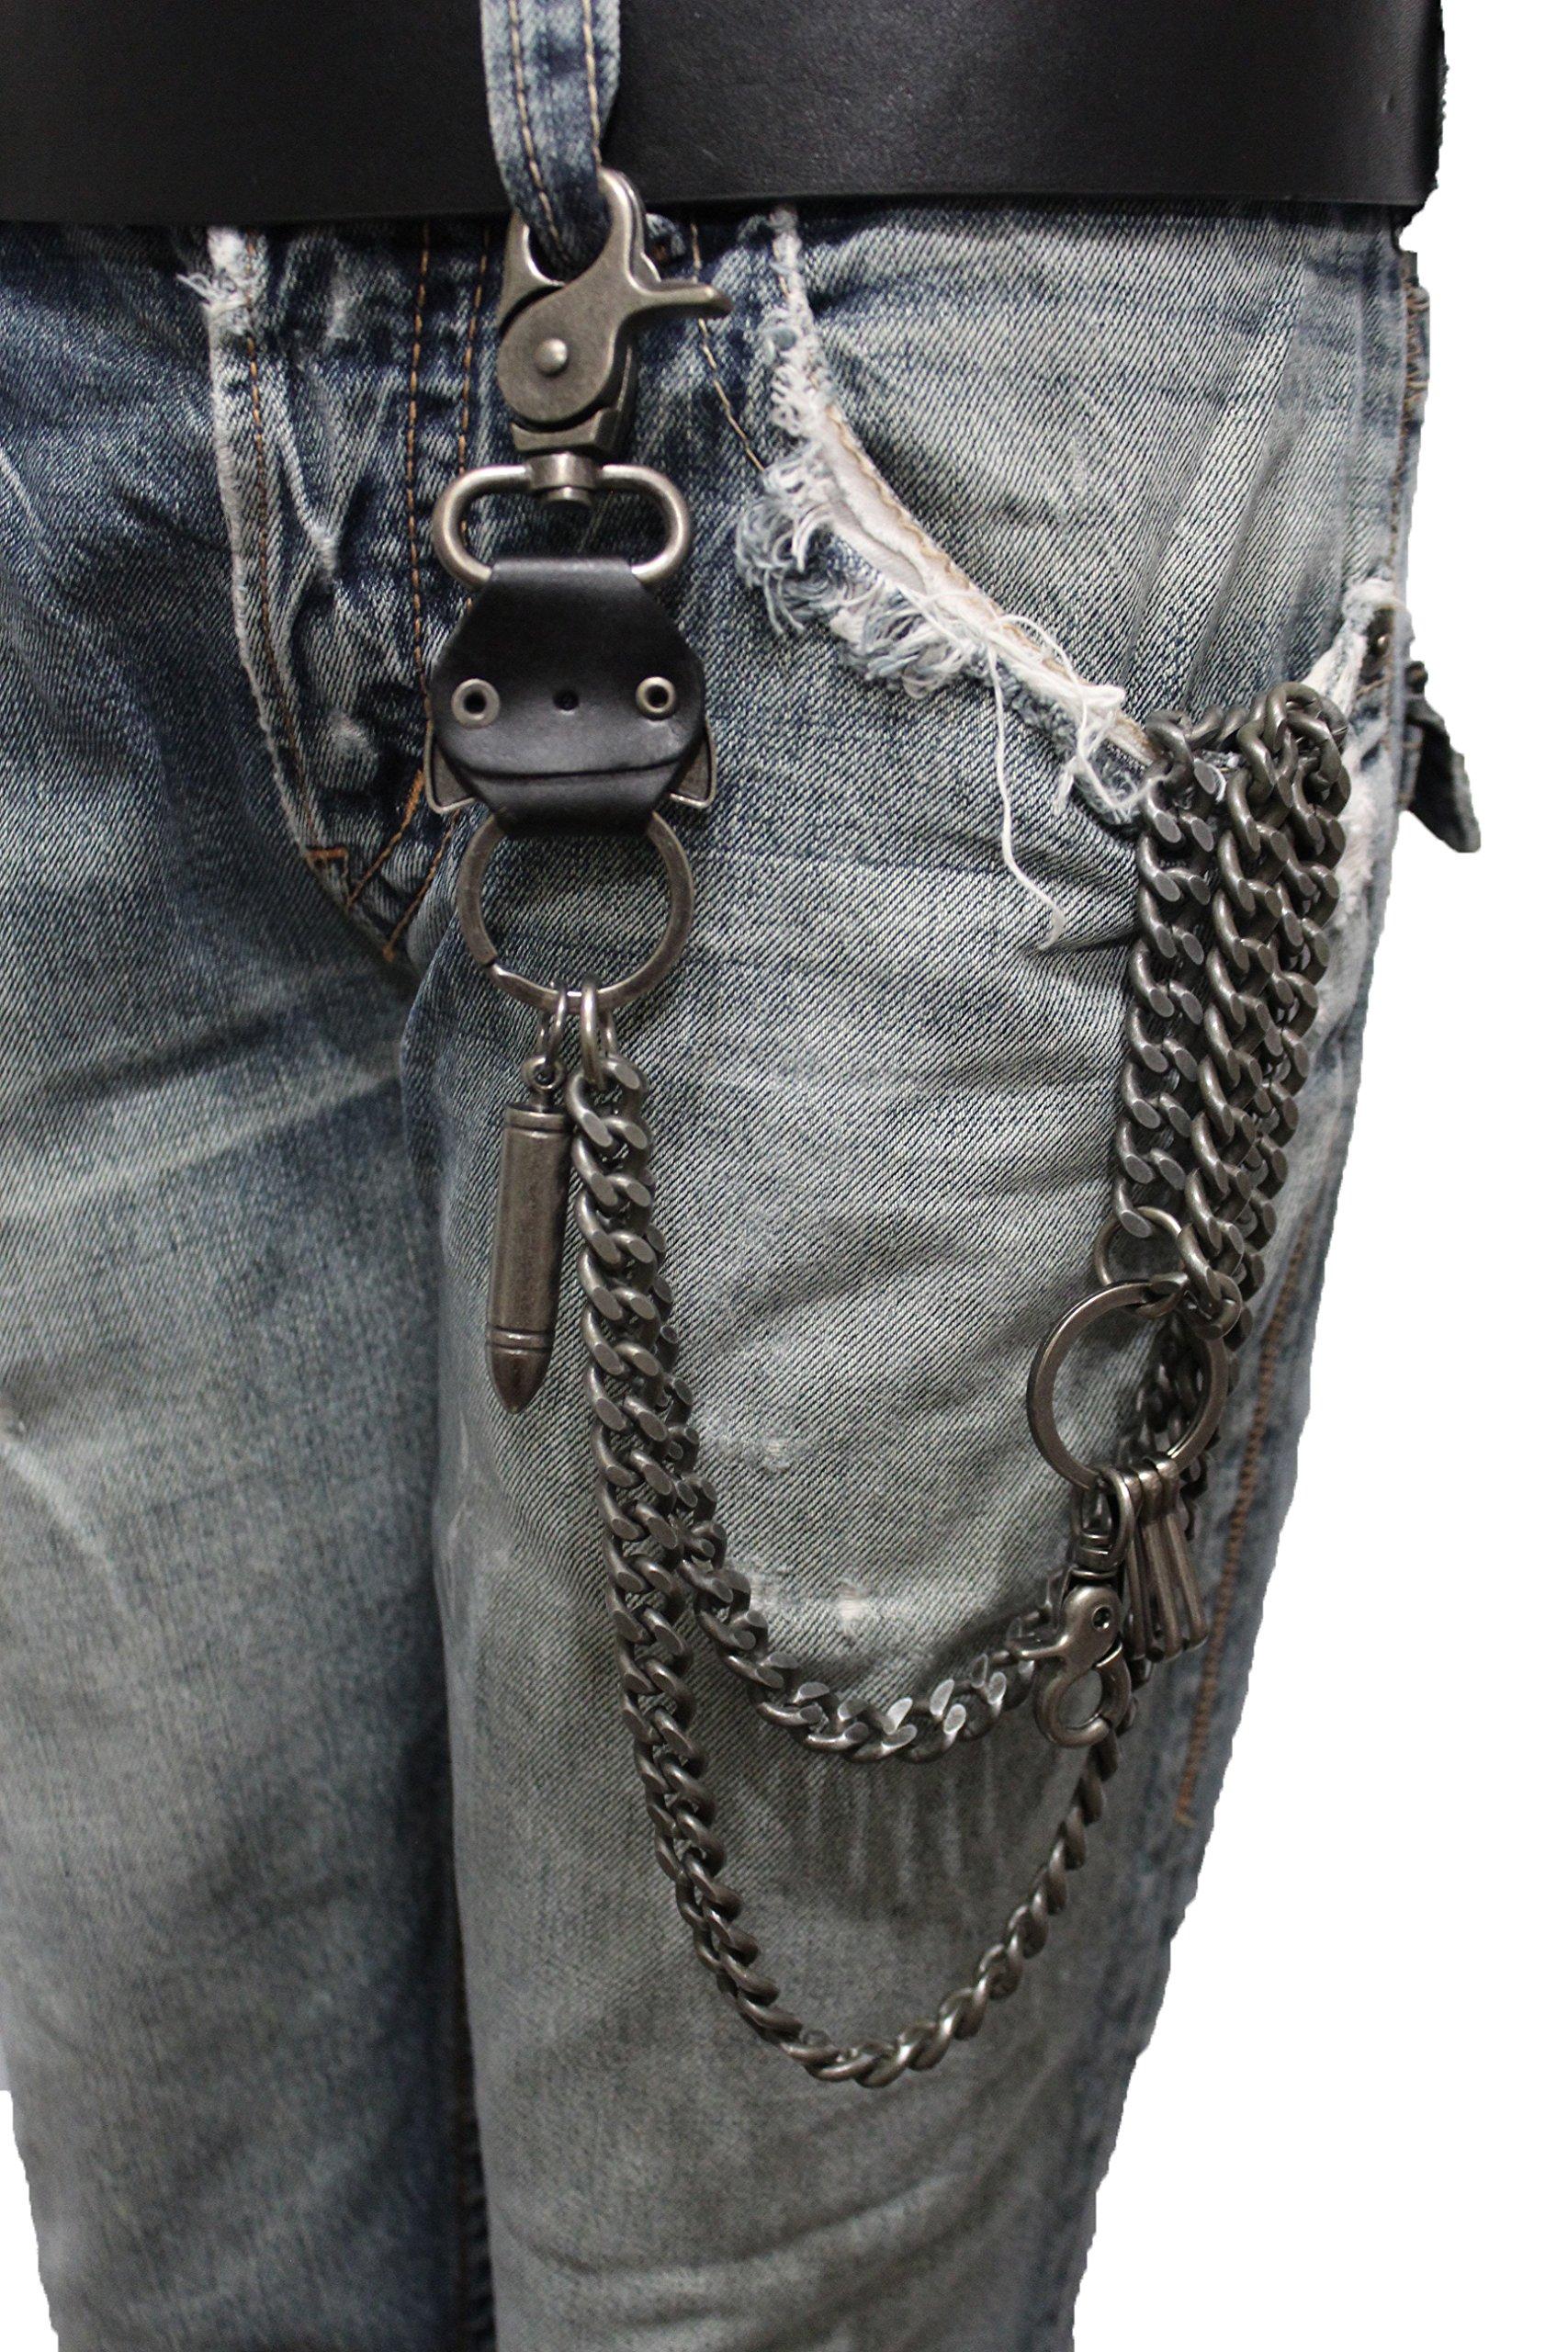 TFJ Men Wallet Chain Biker Fashion Metal Jeans Guns Bullets Charm Skull Rusty Silver